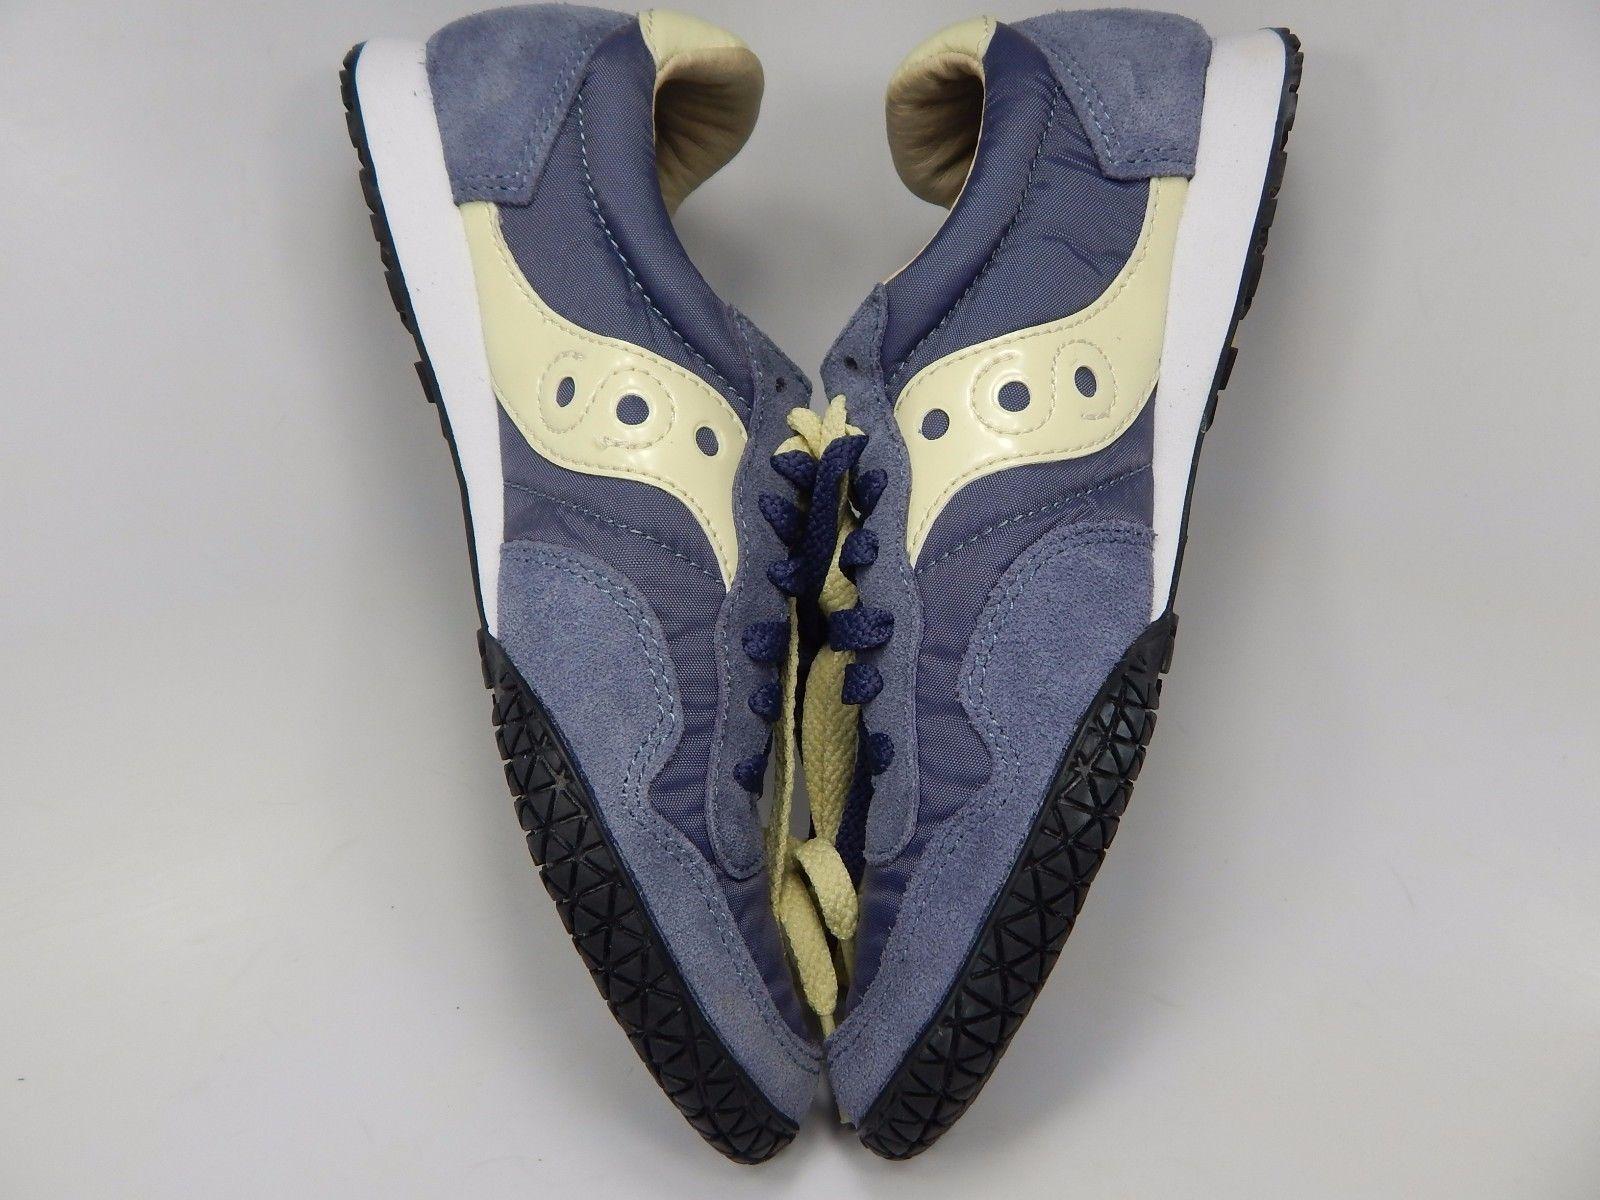 Saucony Original Bullet Women's Running Shoes Sz 7 M (B) EU 38 Purple S1943-148